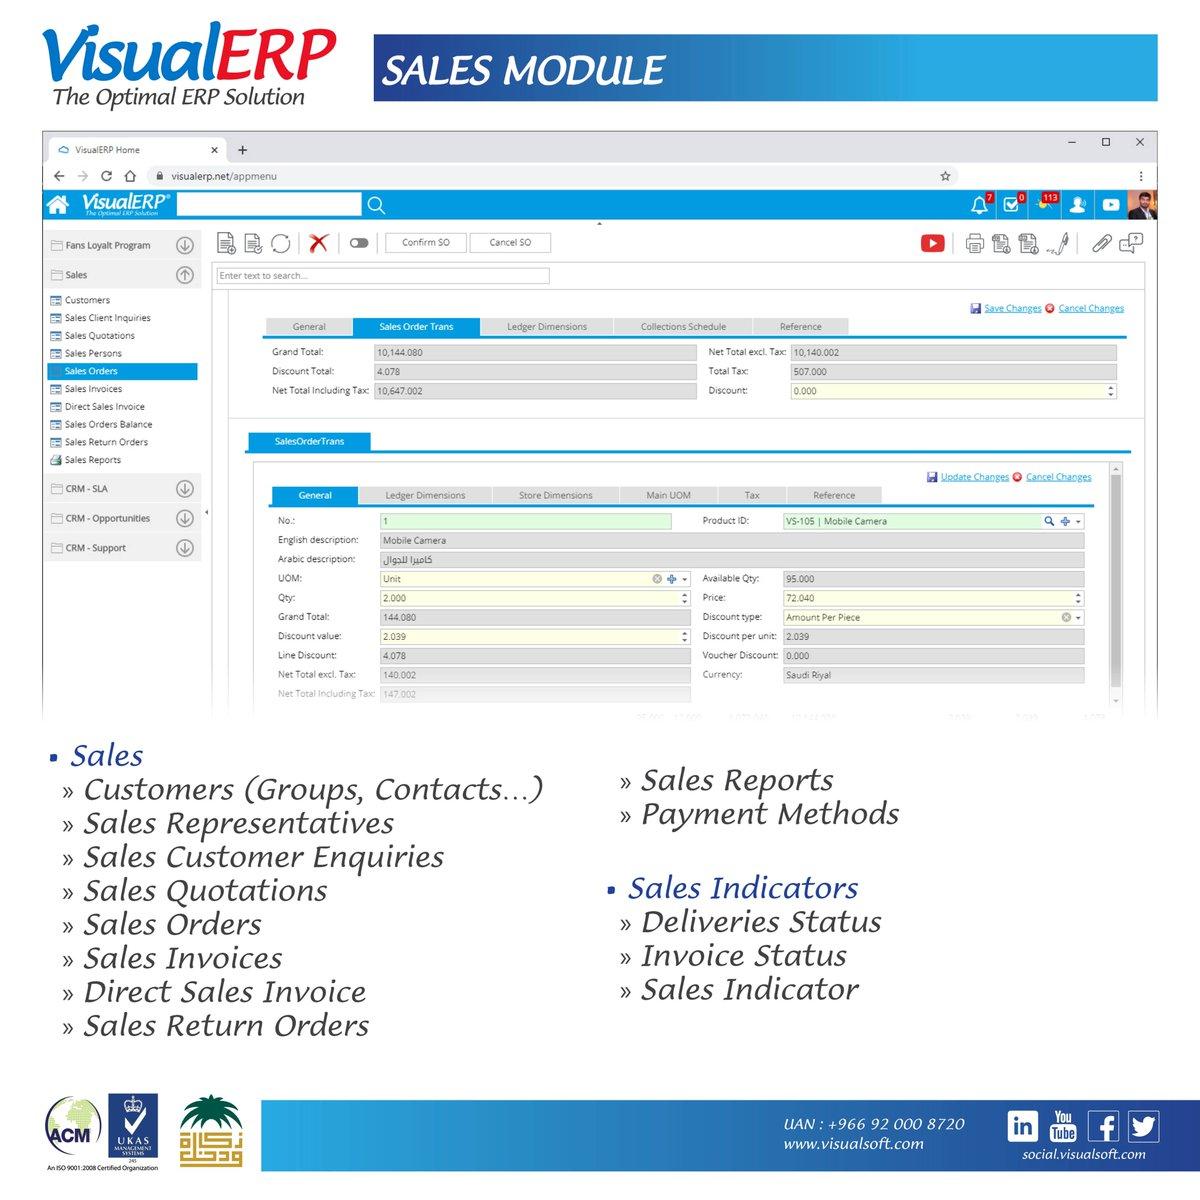 #VisualERP #Features  #Sales #Module #ERP #KSA